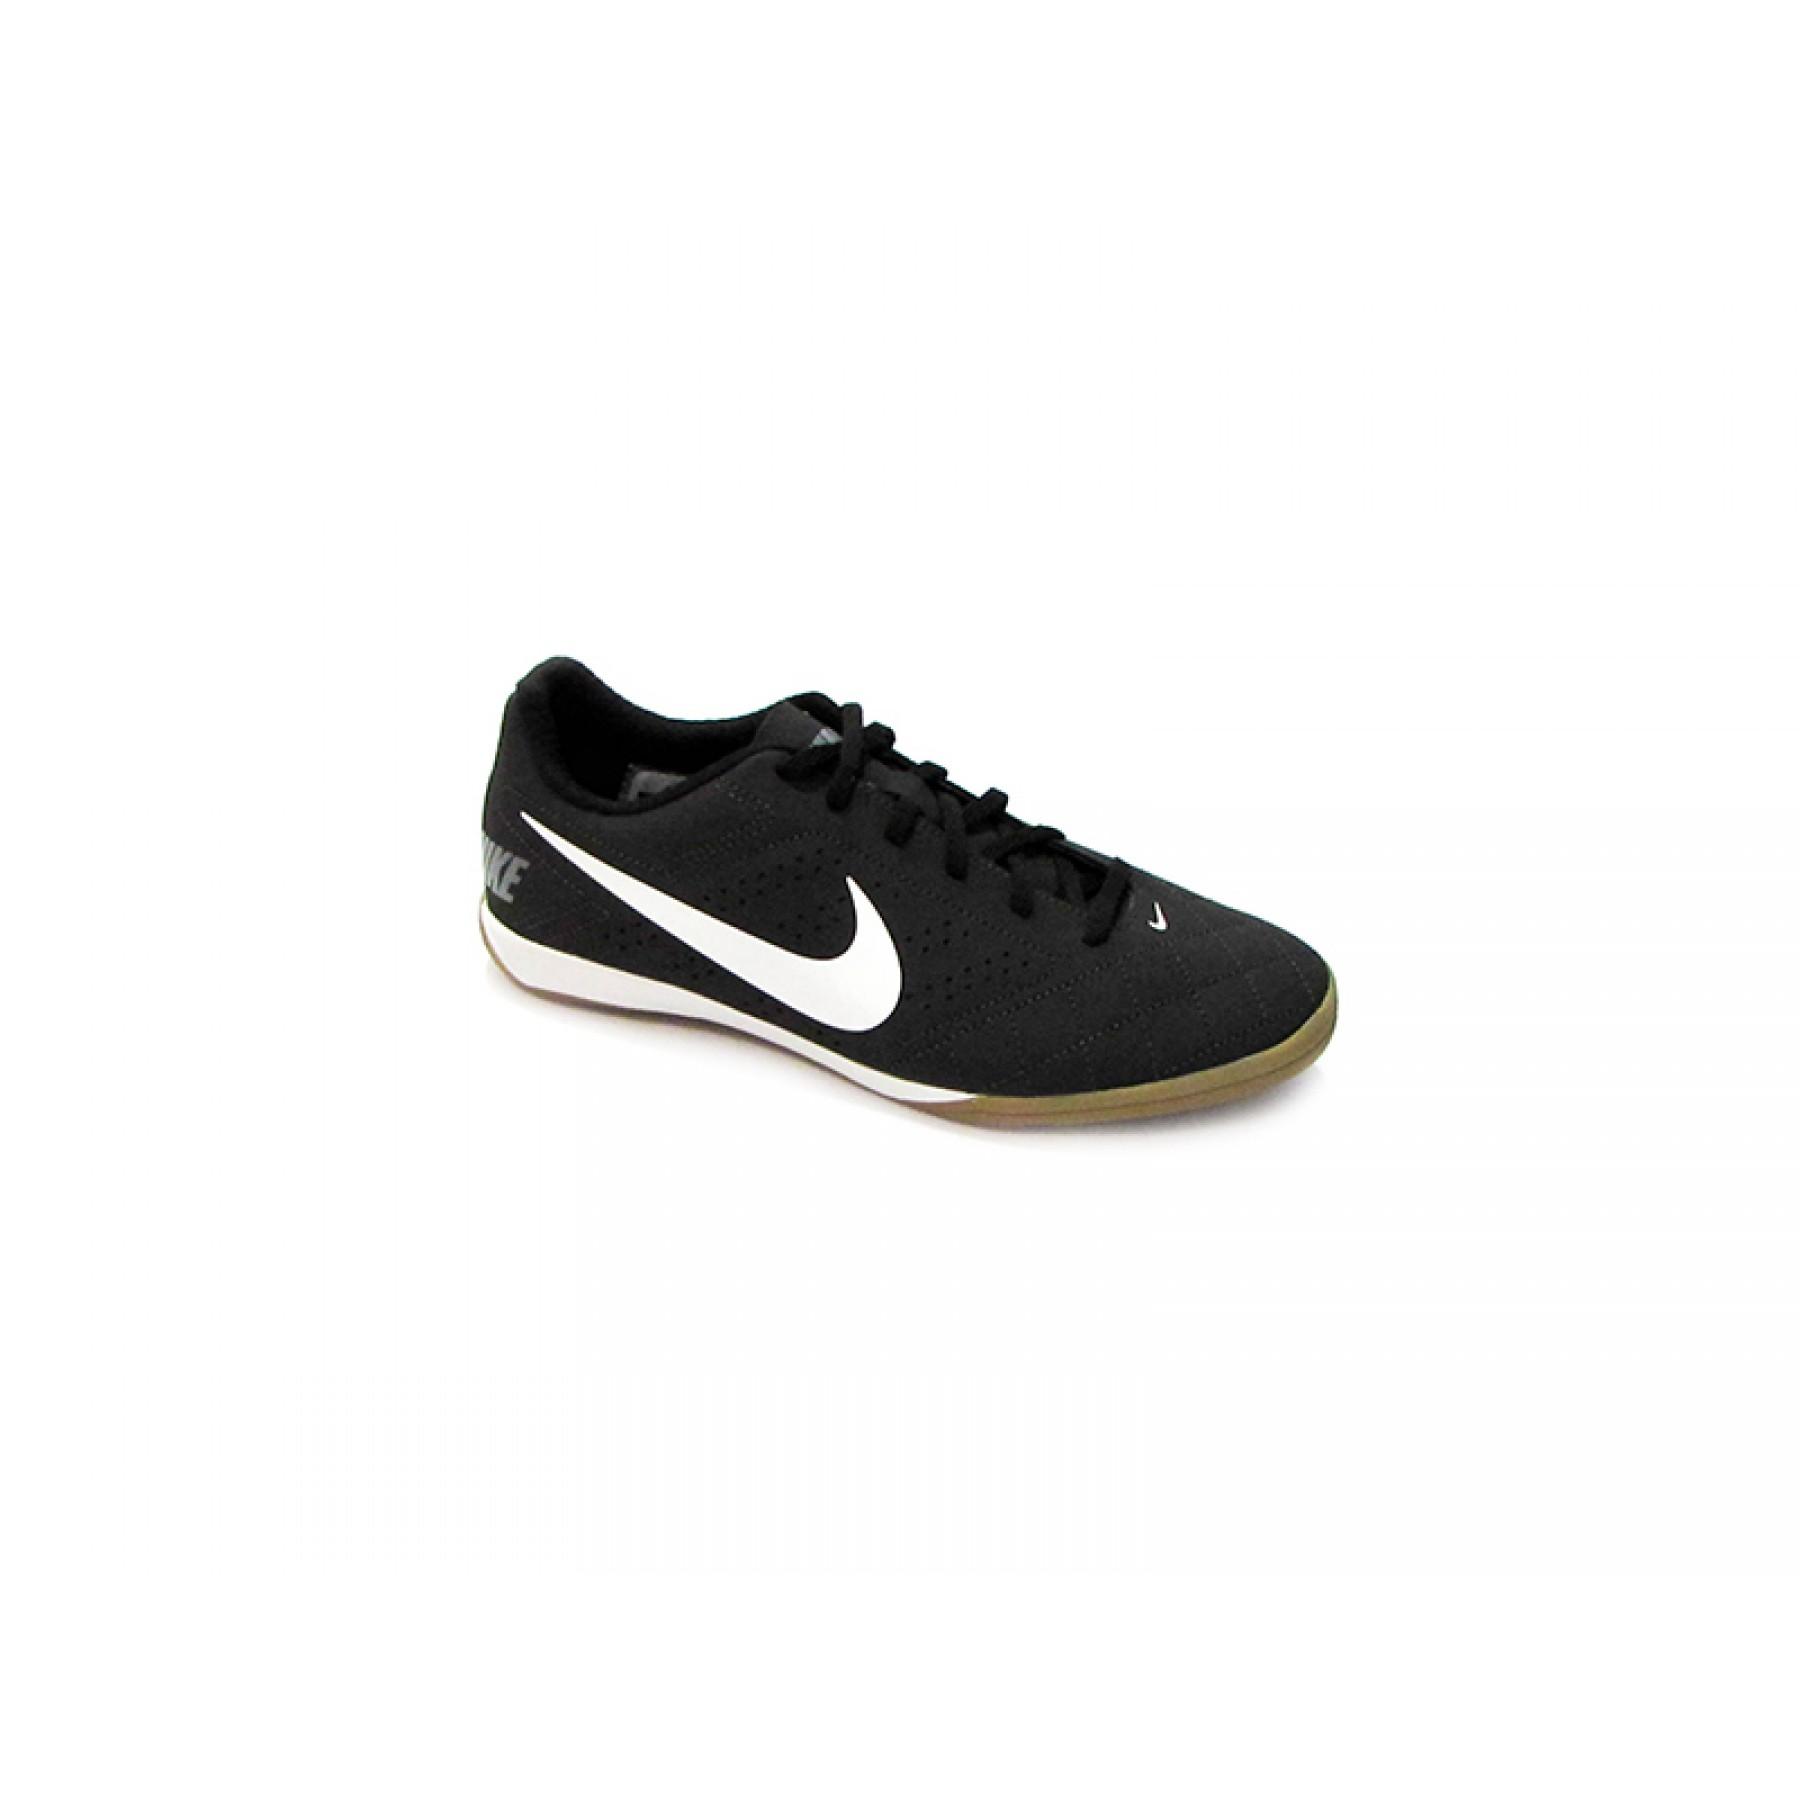 d548bf4cd281d Tênis Nike Beco 2 Masculino - Loja de Calçados Online